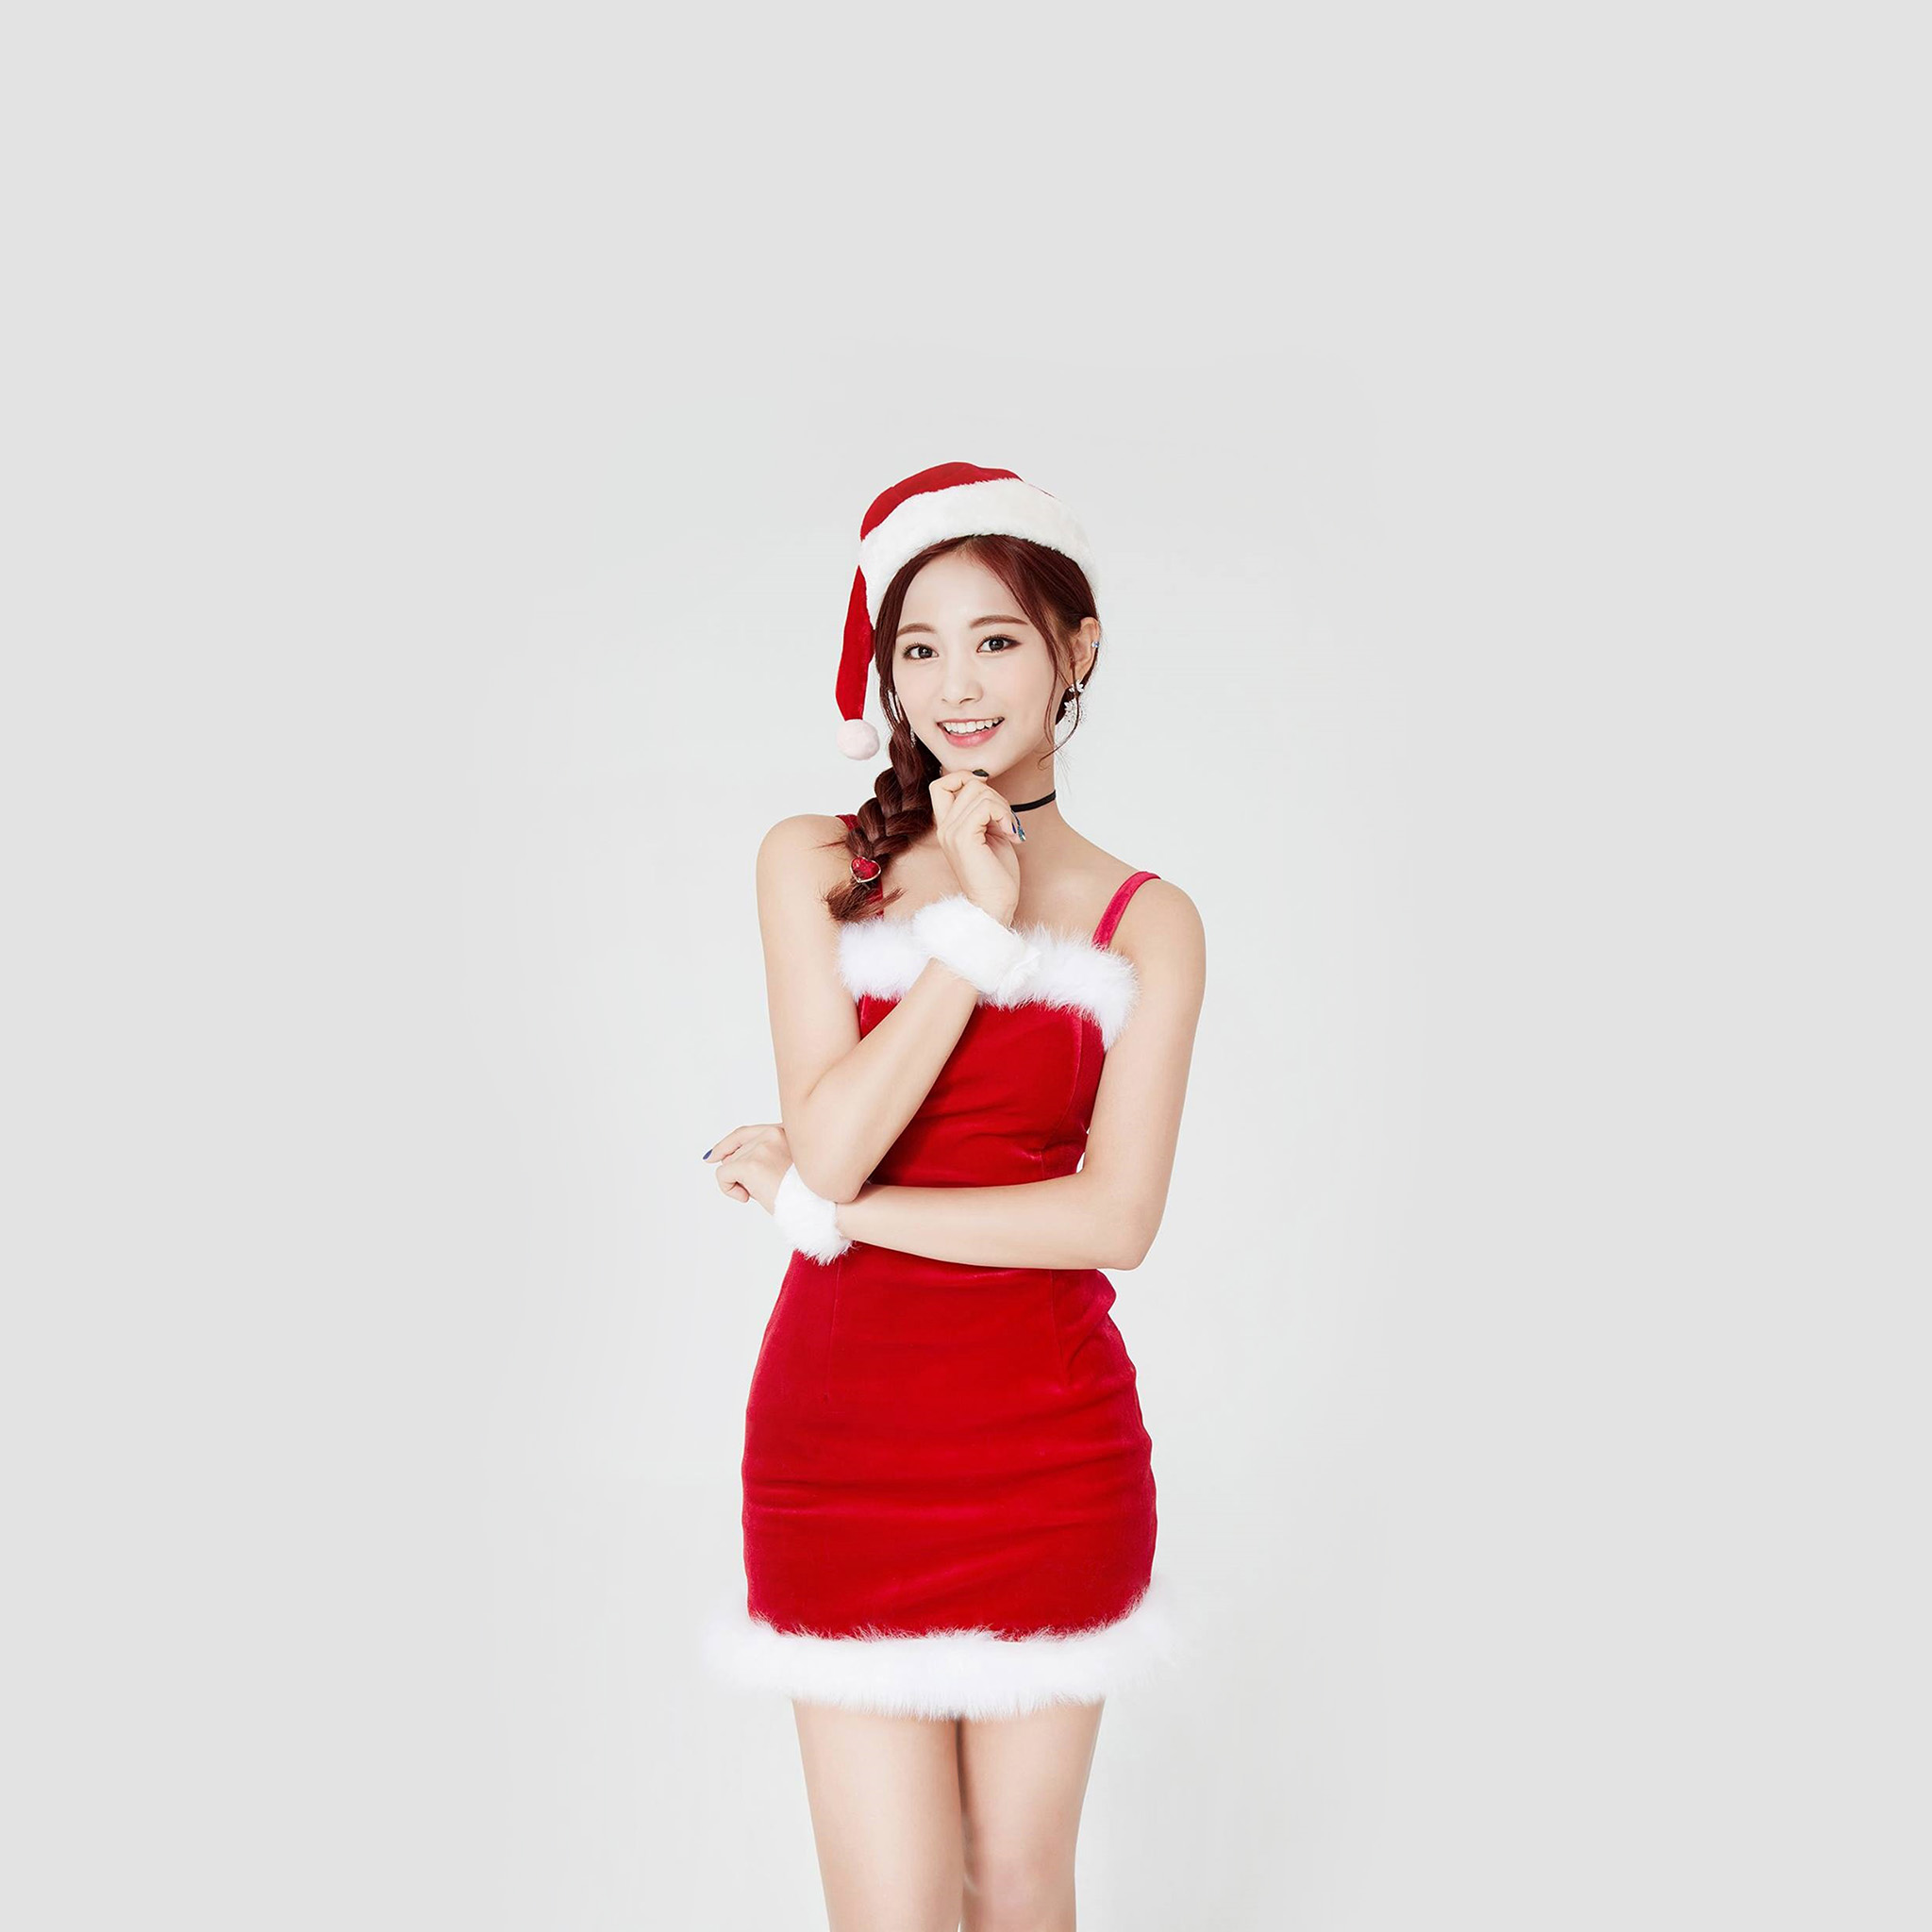 Wallpaper Android Hd Girl Hp14 Twice Tzuyu Girl Christmas Kpop Wallpaper